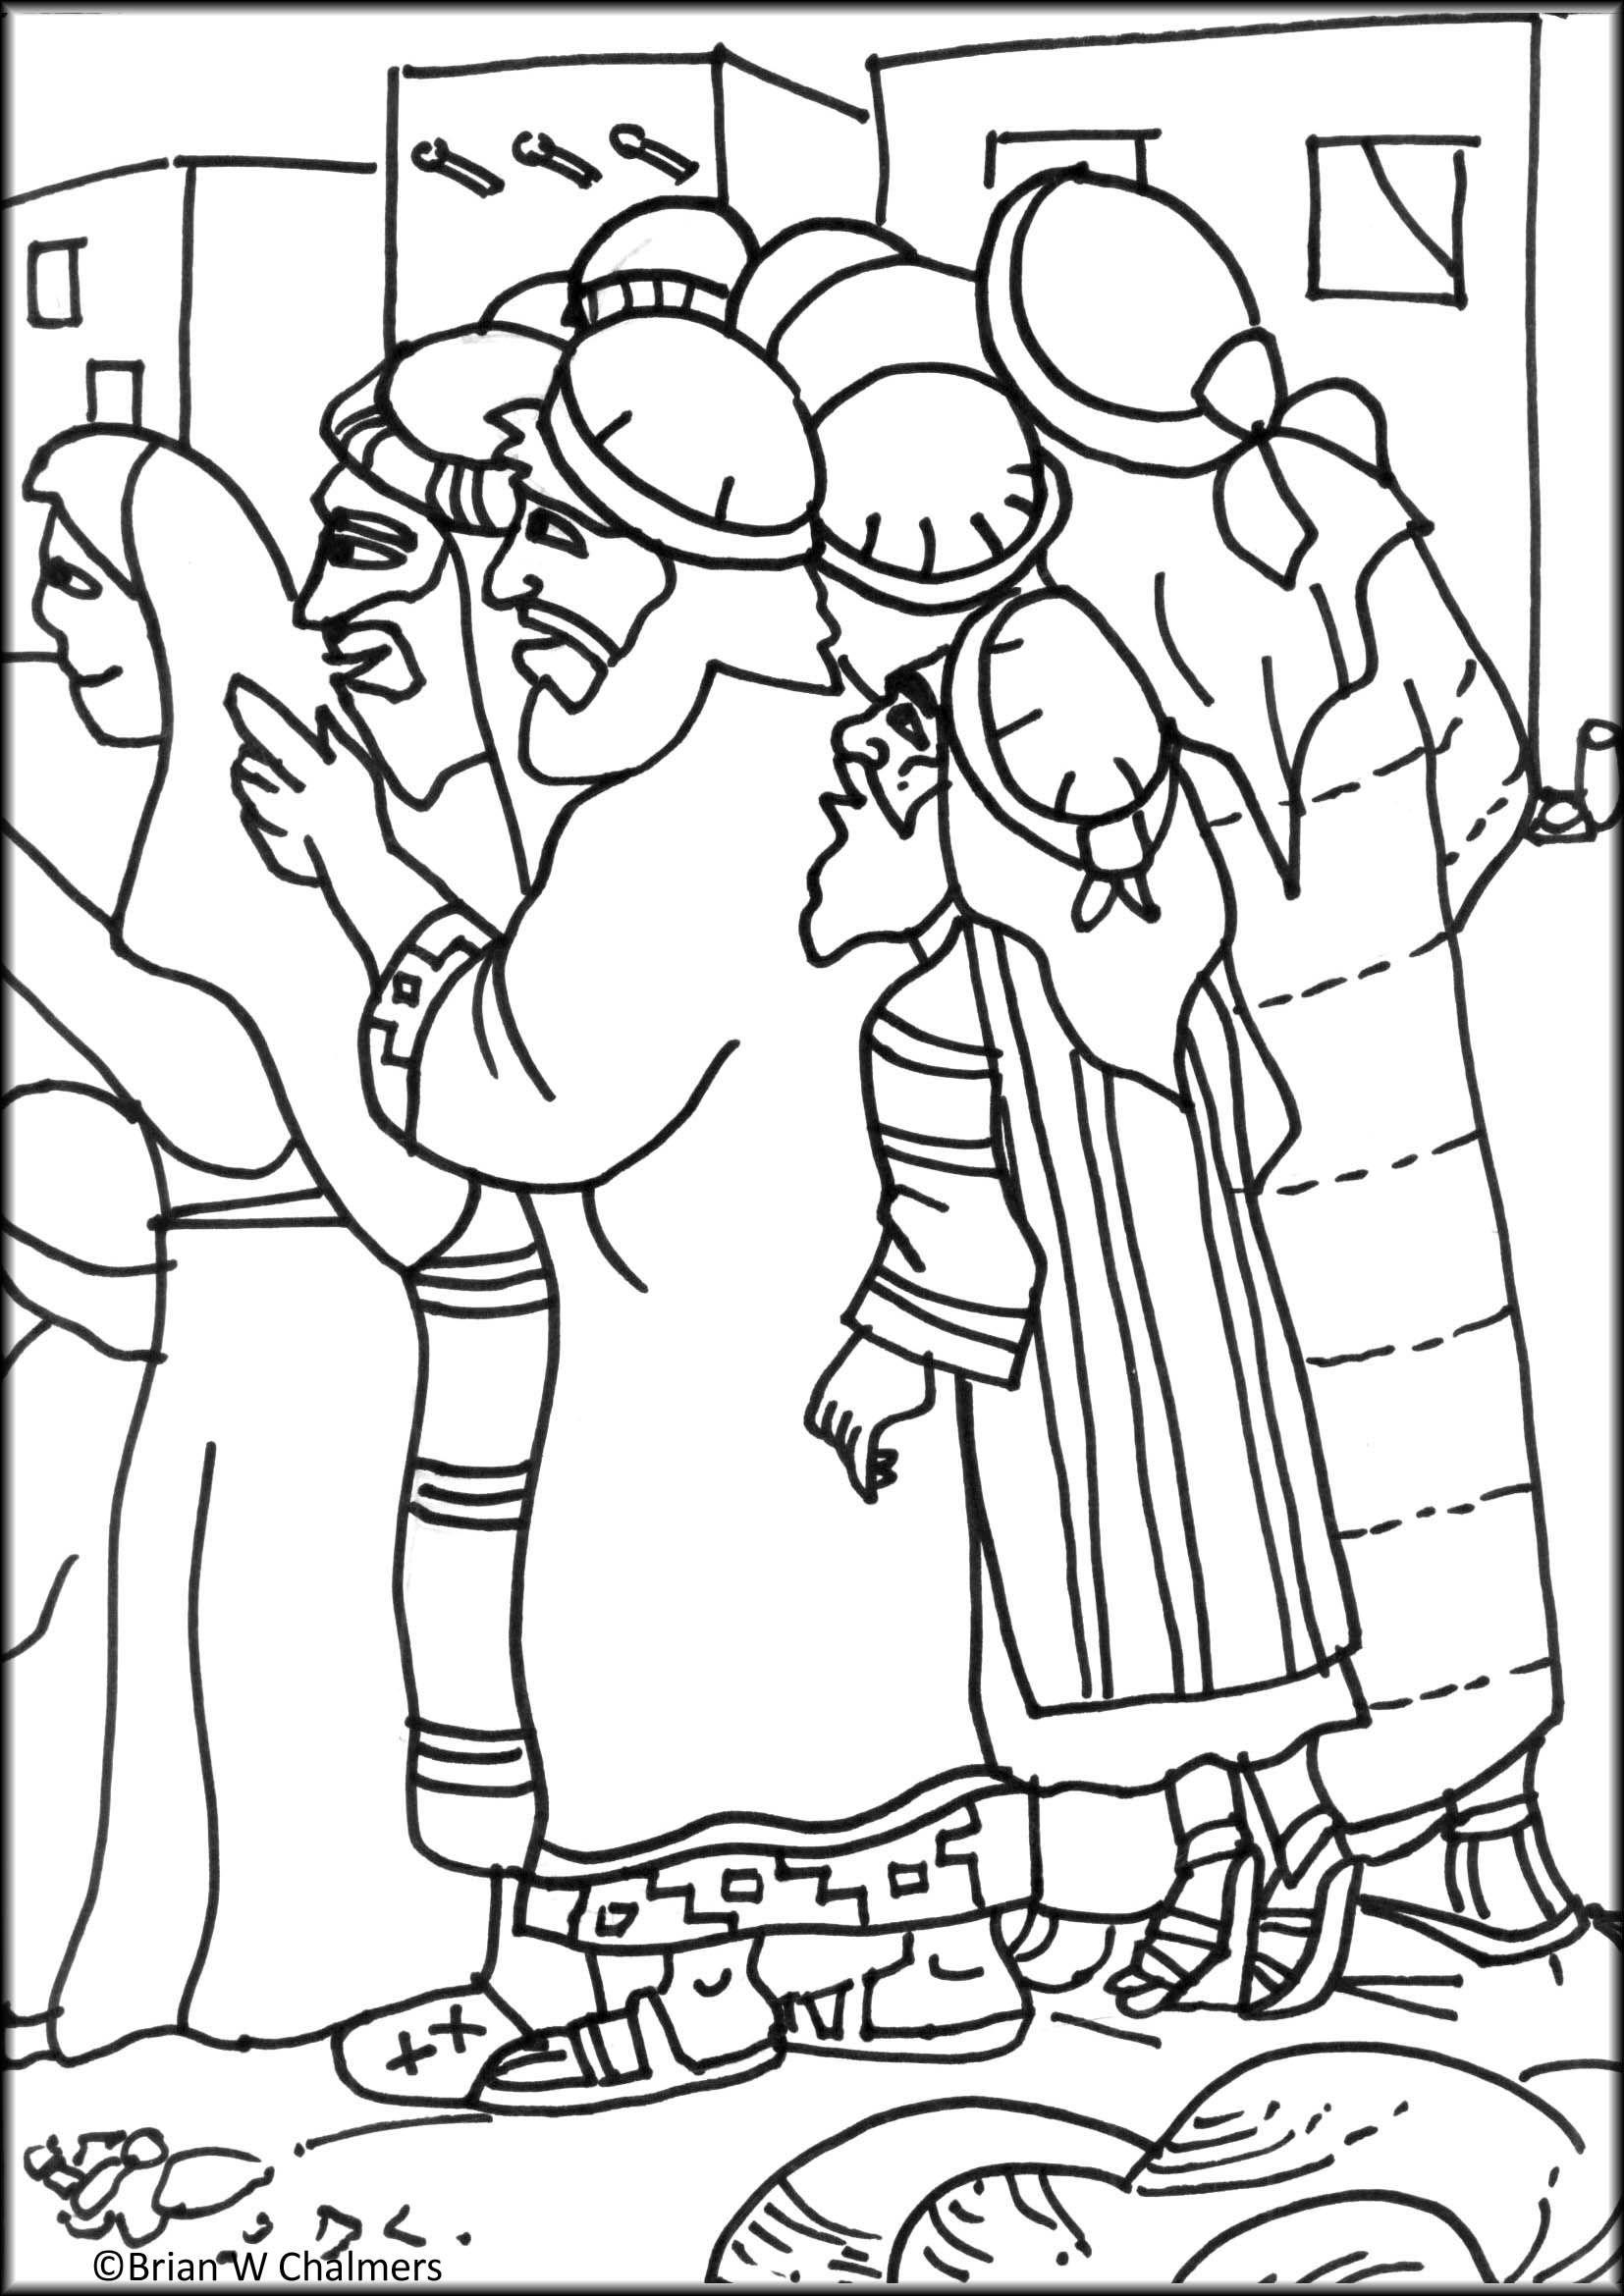 zaccheus coloring page | Dibujos Biblicos | Pinterest | Zacchaeus ...